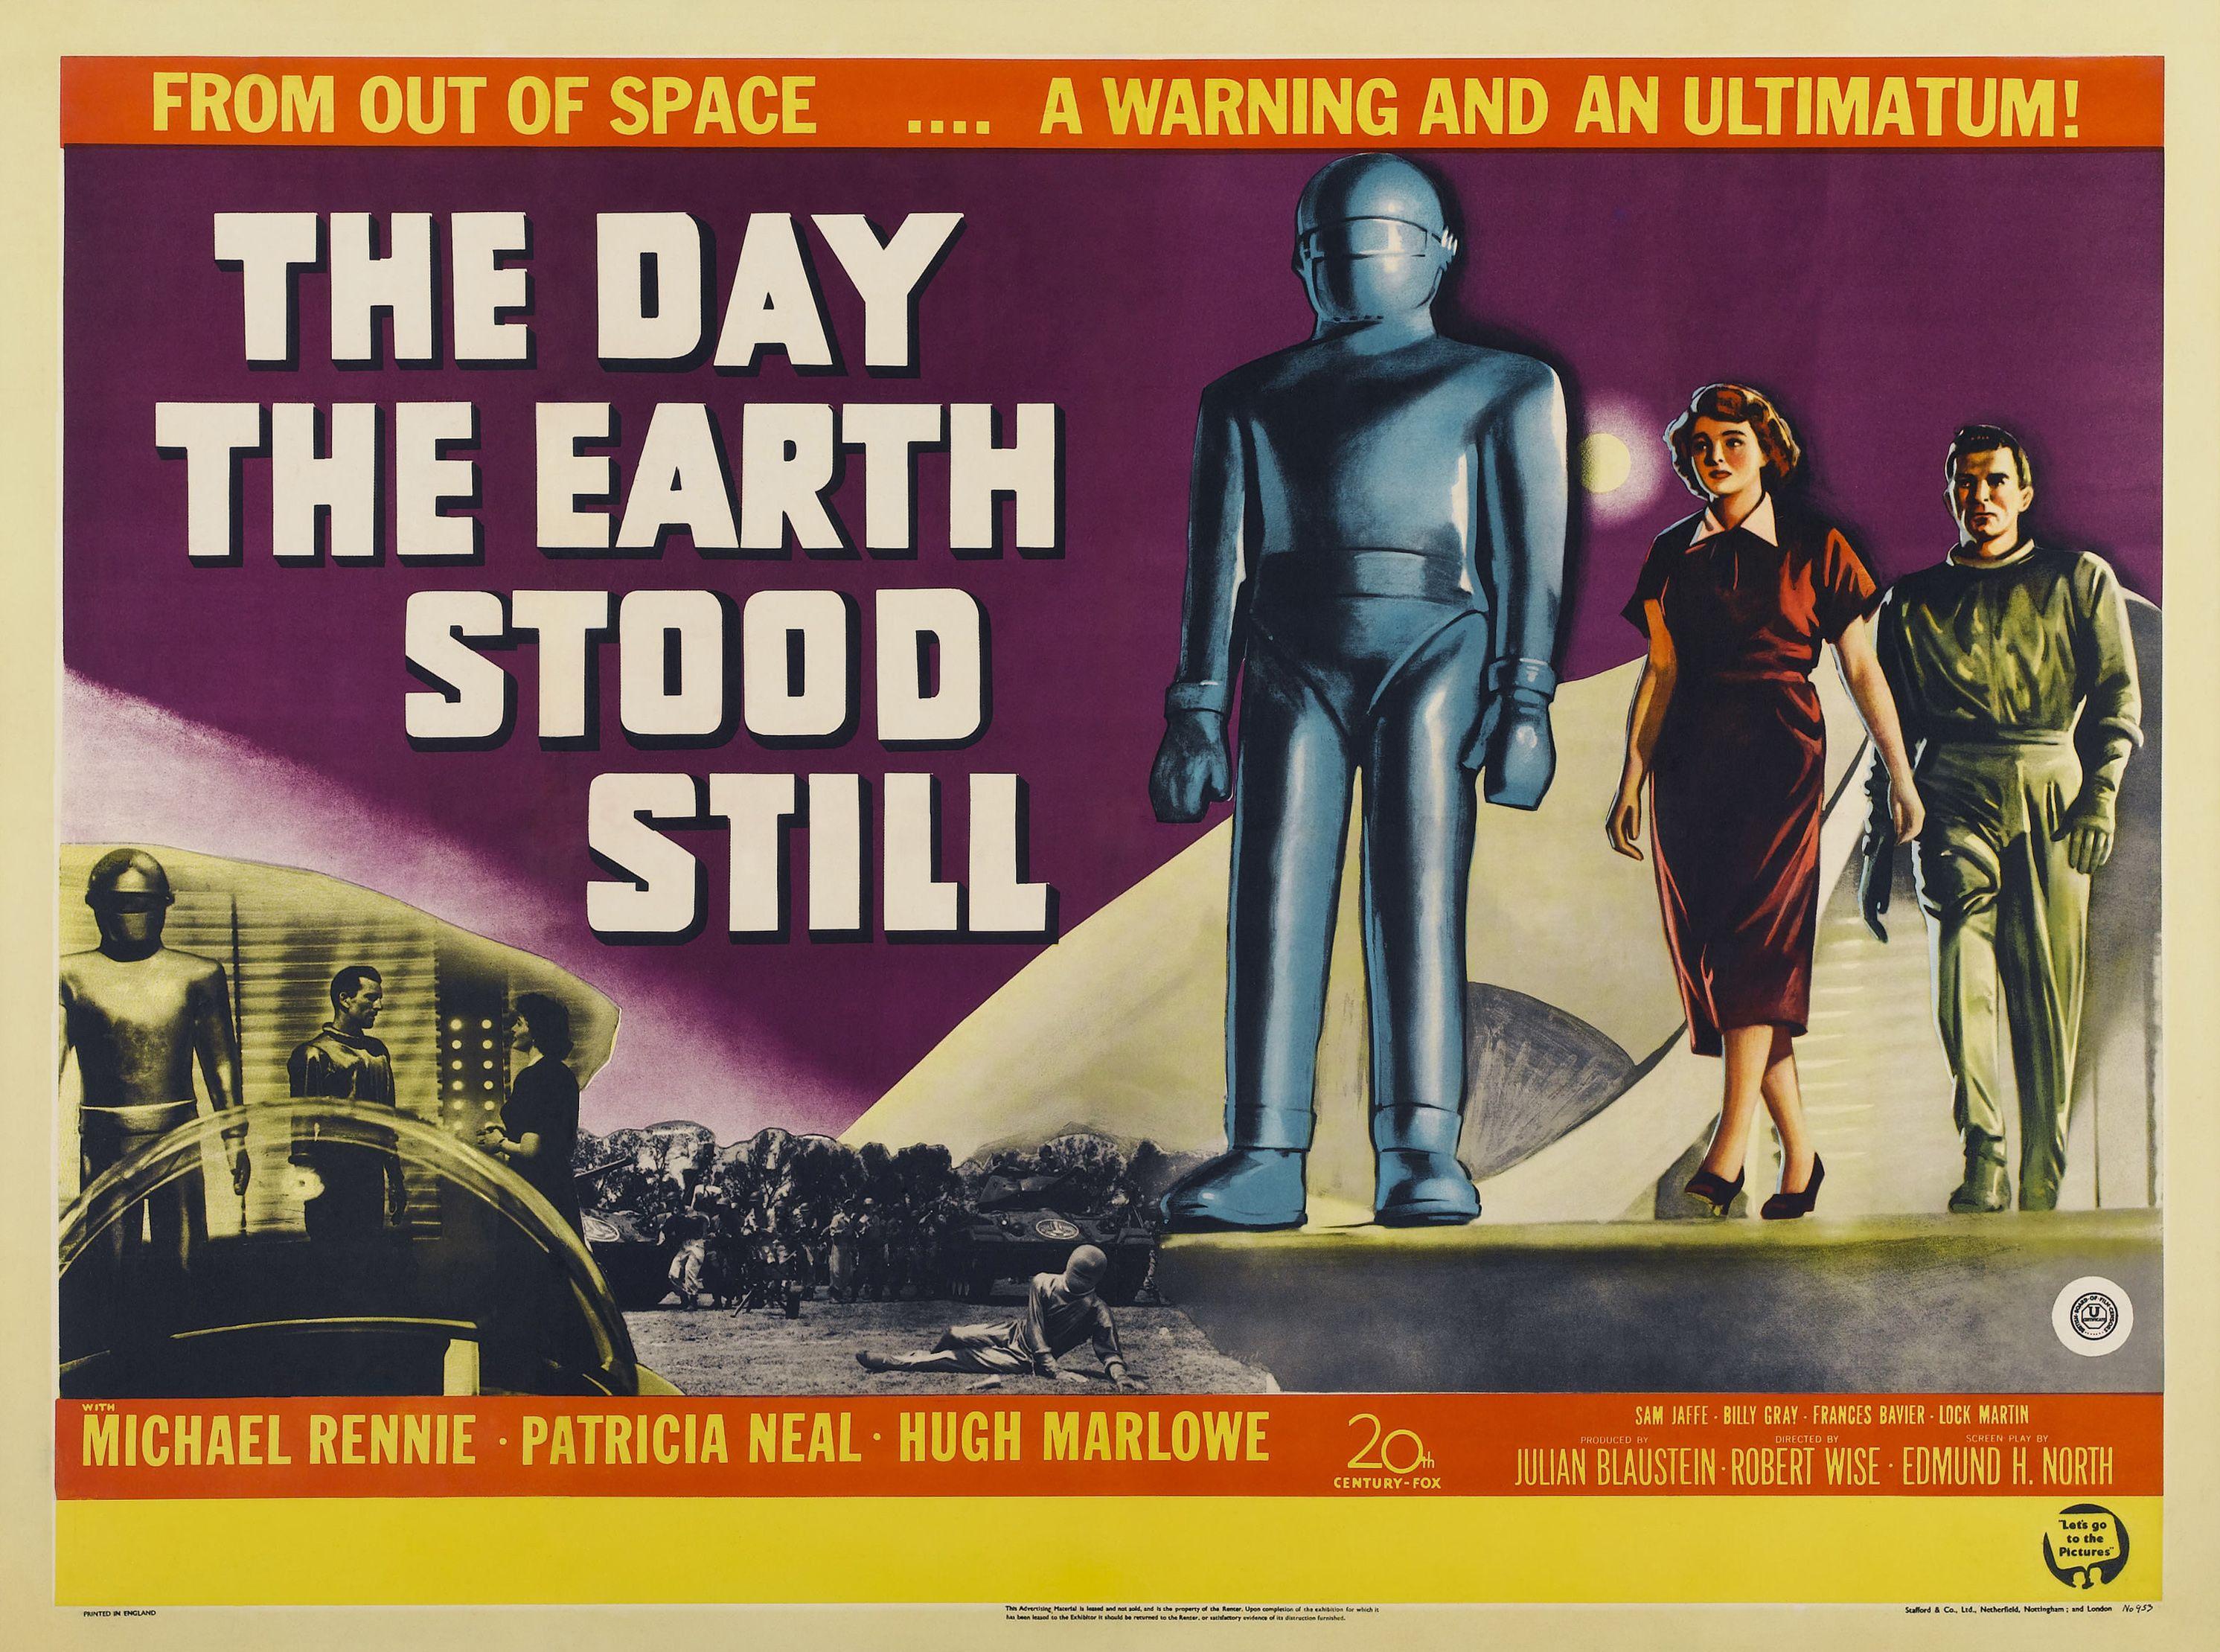 The Day the Earth Stood Still (2008) - IMDb